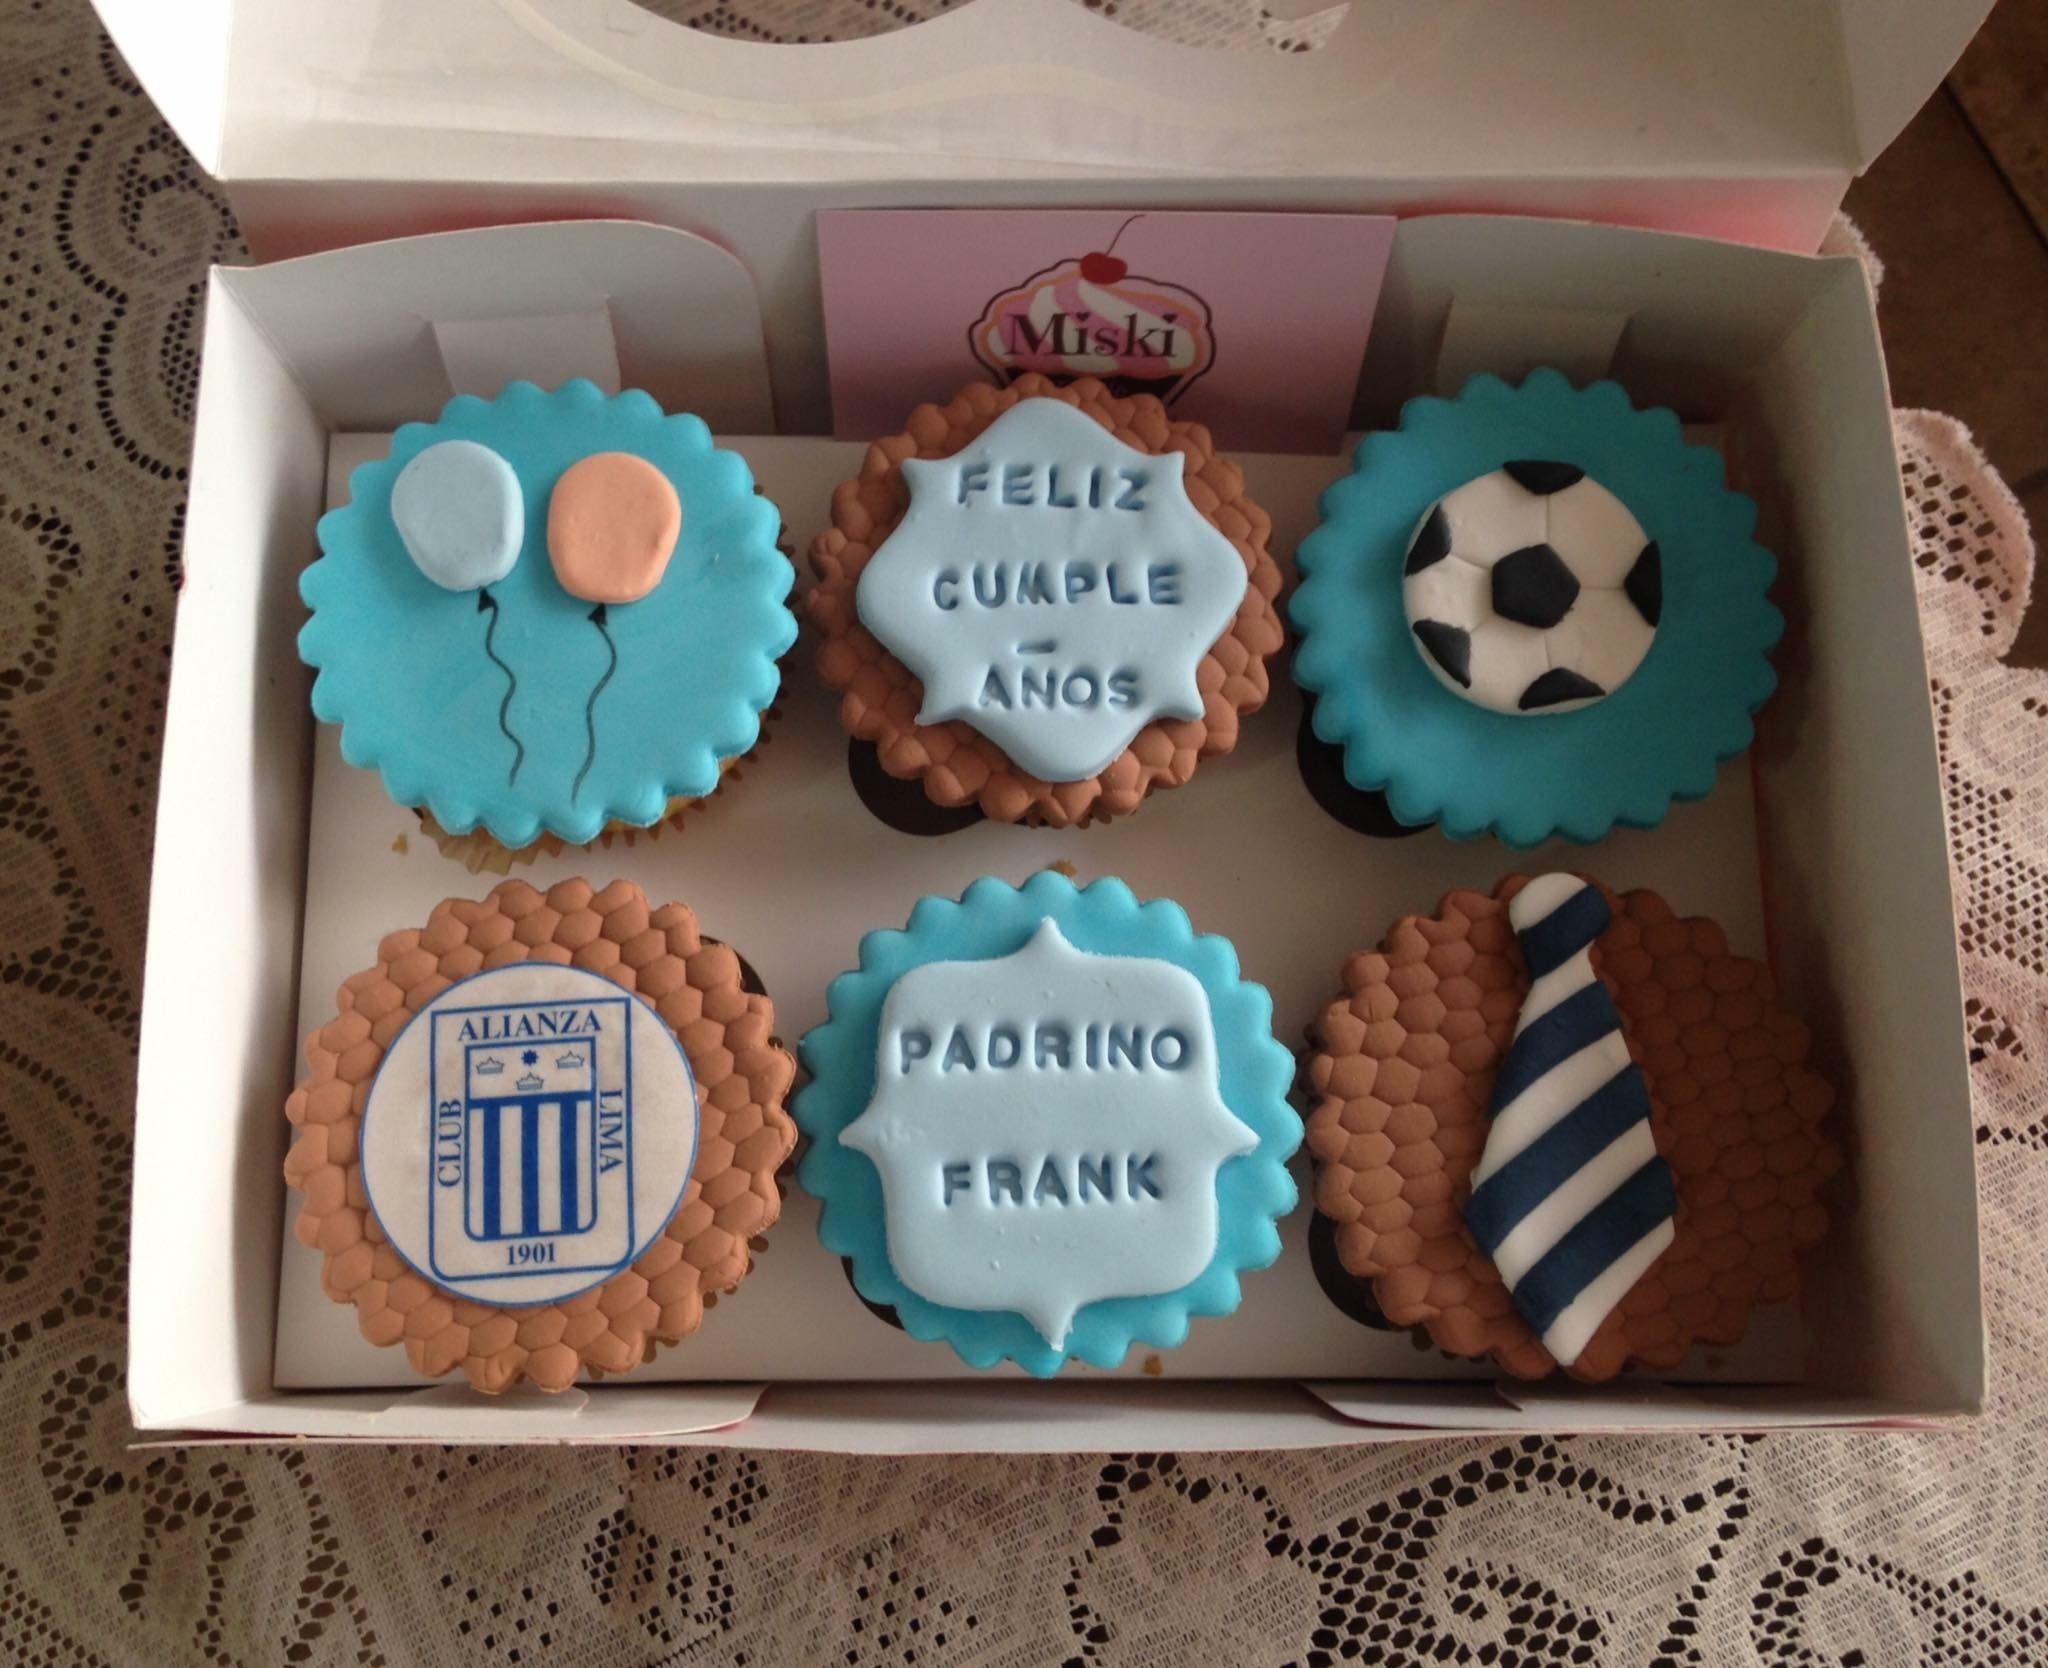 #cupcakes para desearle un feliz #cumpleaños a un #padrino querido. Gracias Sra. Diana #globos #pelota #futbol #alianzalima #corbata #miskitrujillo